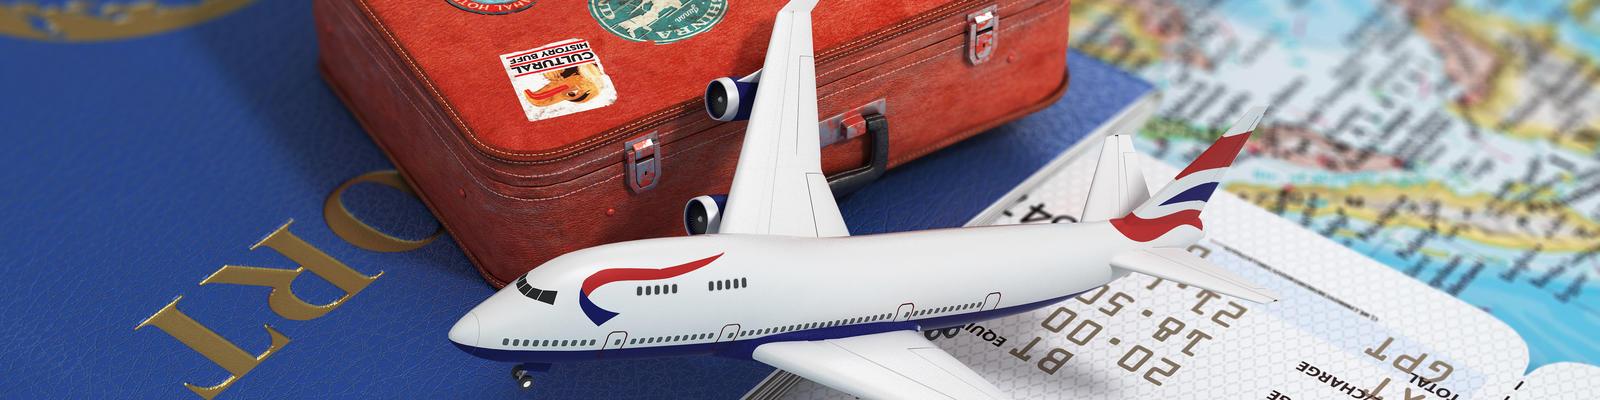 Best Cruise Travel Agents (Photo: vipman/Shutterstock)